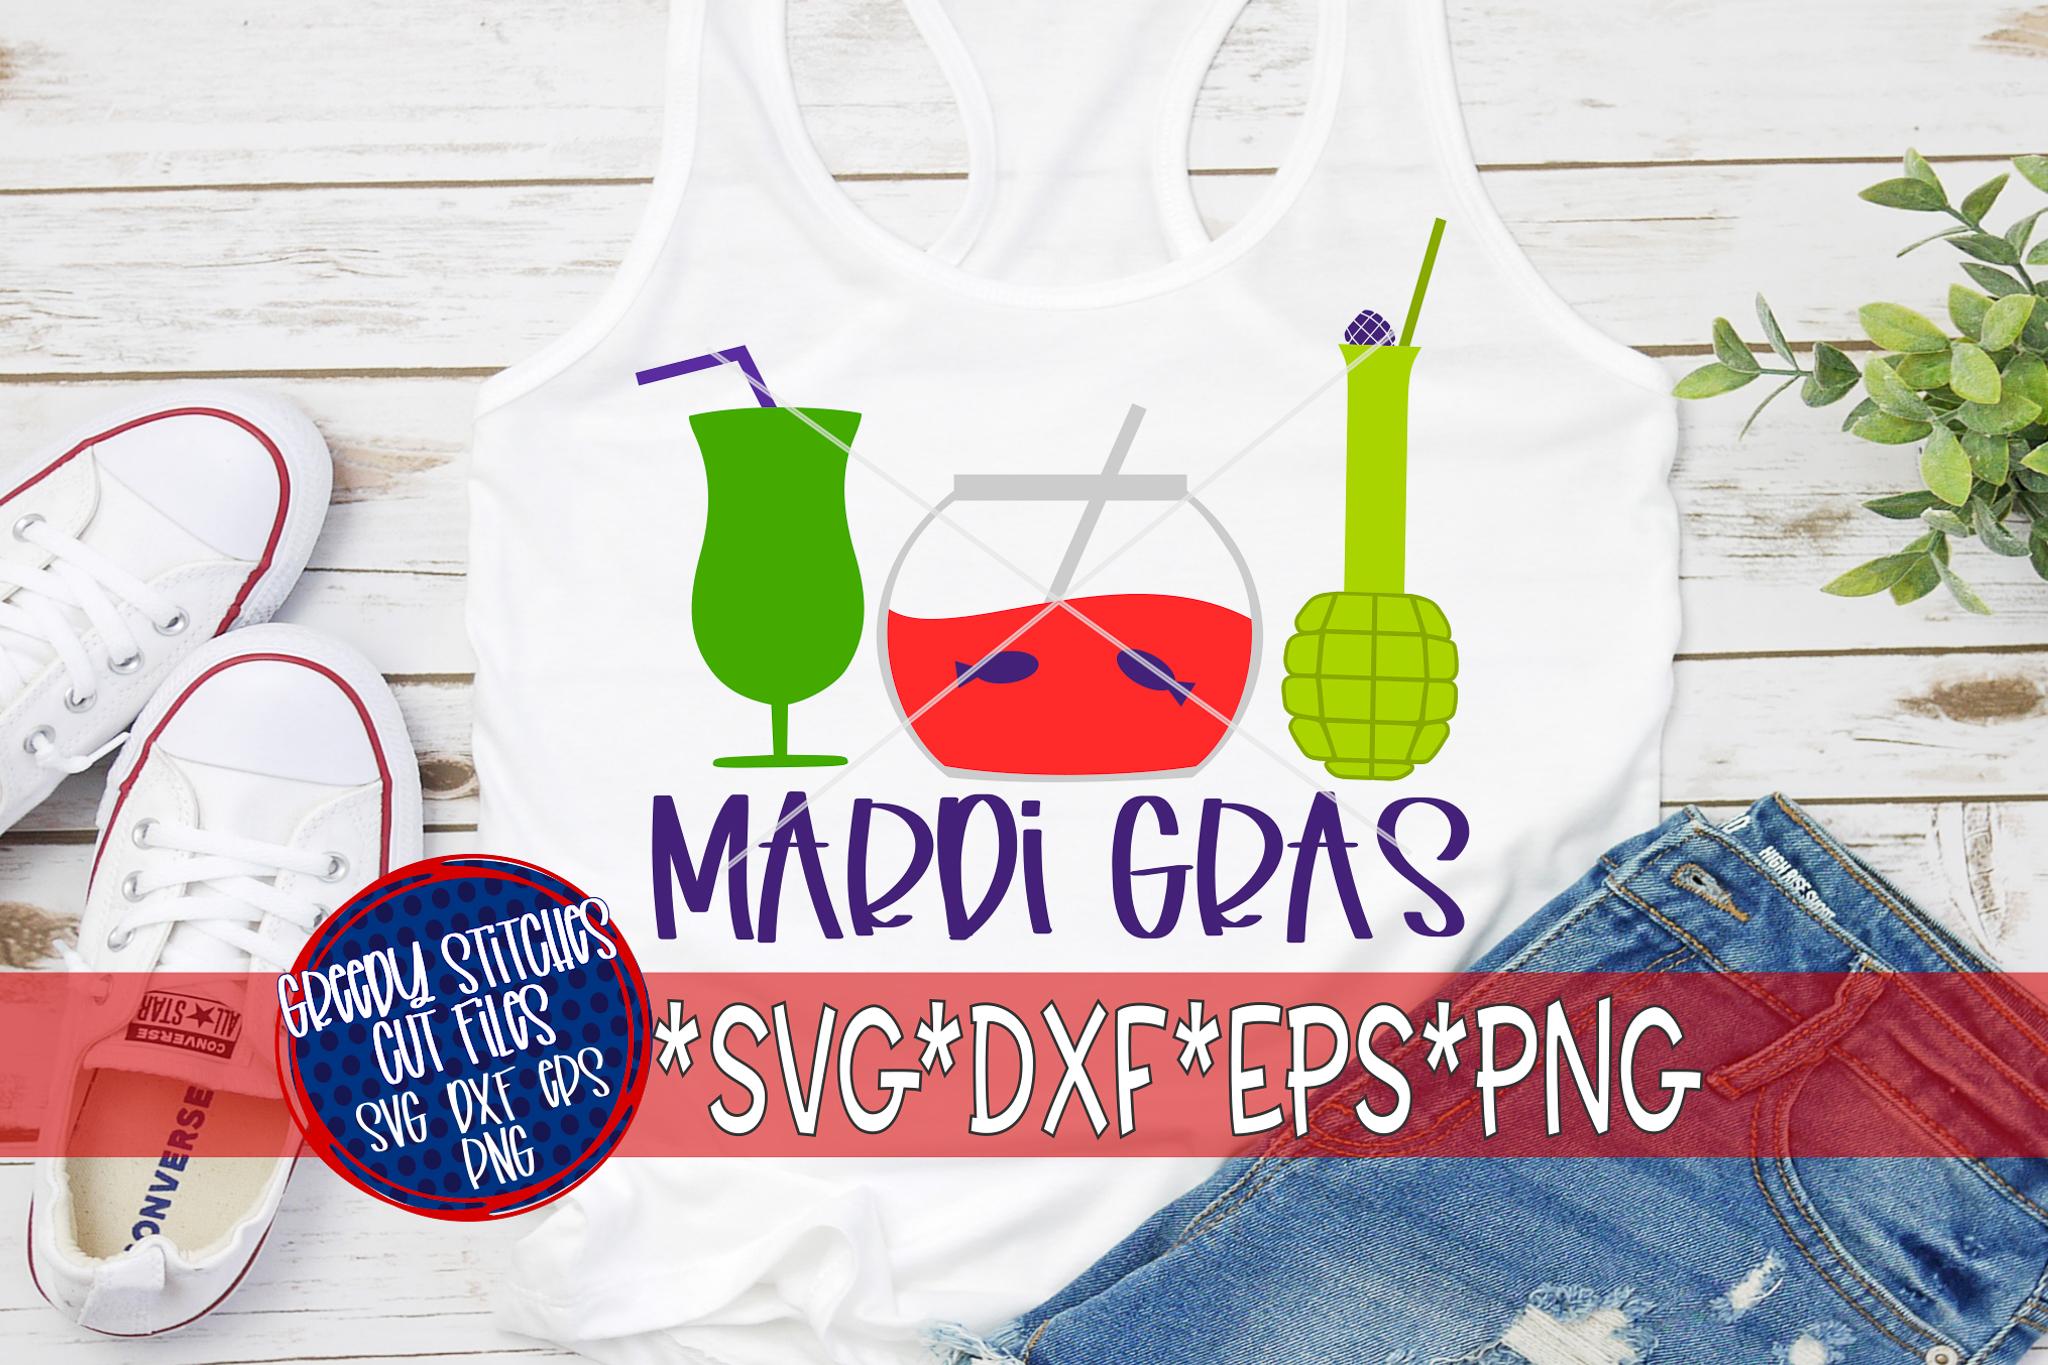 Mardi Gras |Mardi Gras Drinks SVG DXF EPS PNG example image 5